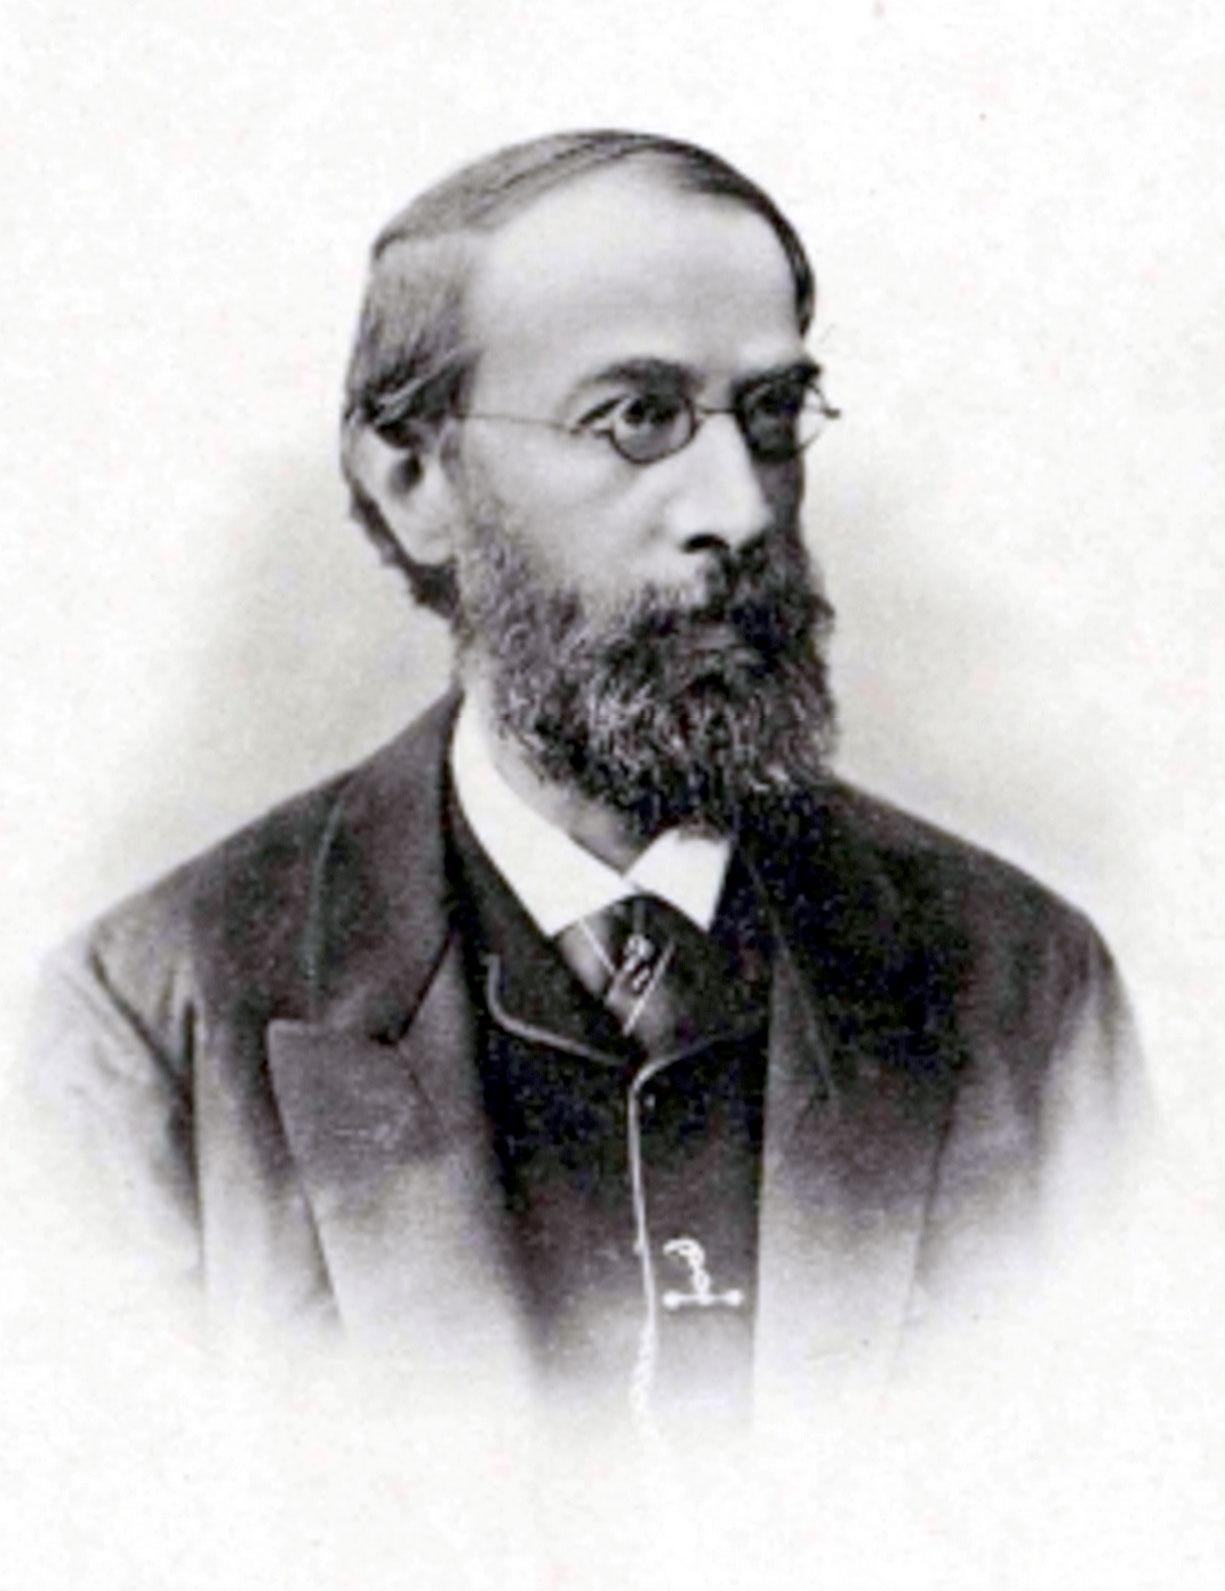 Ottokar Lorenz